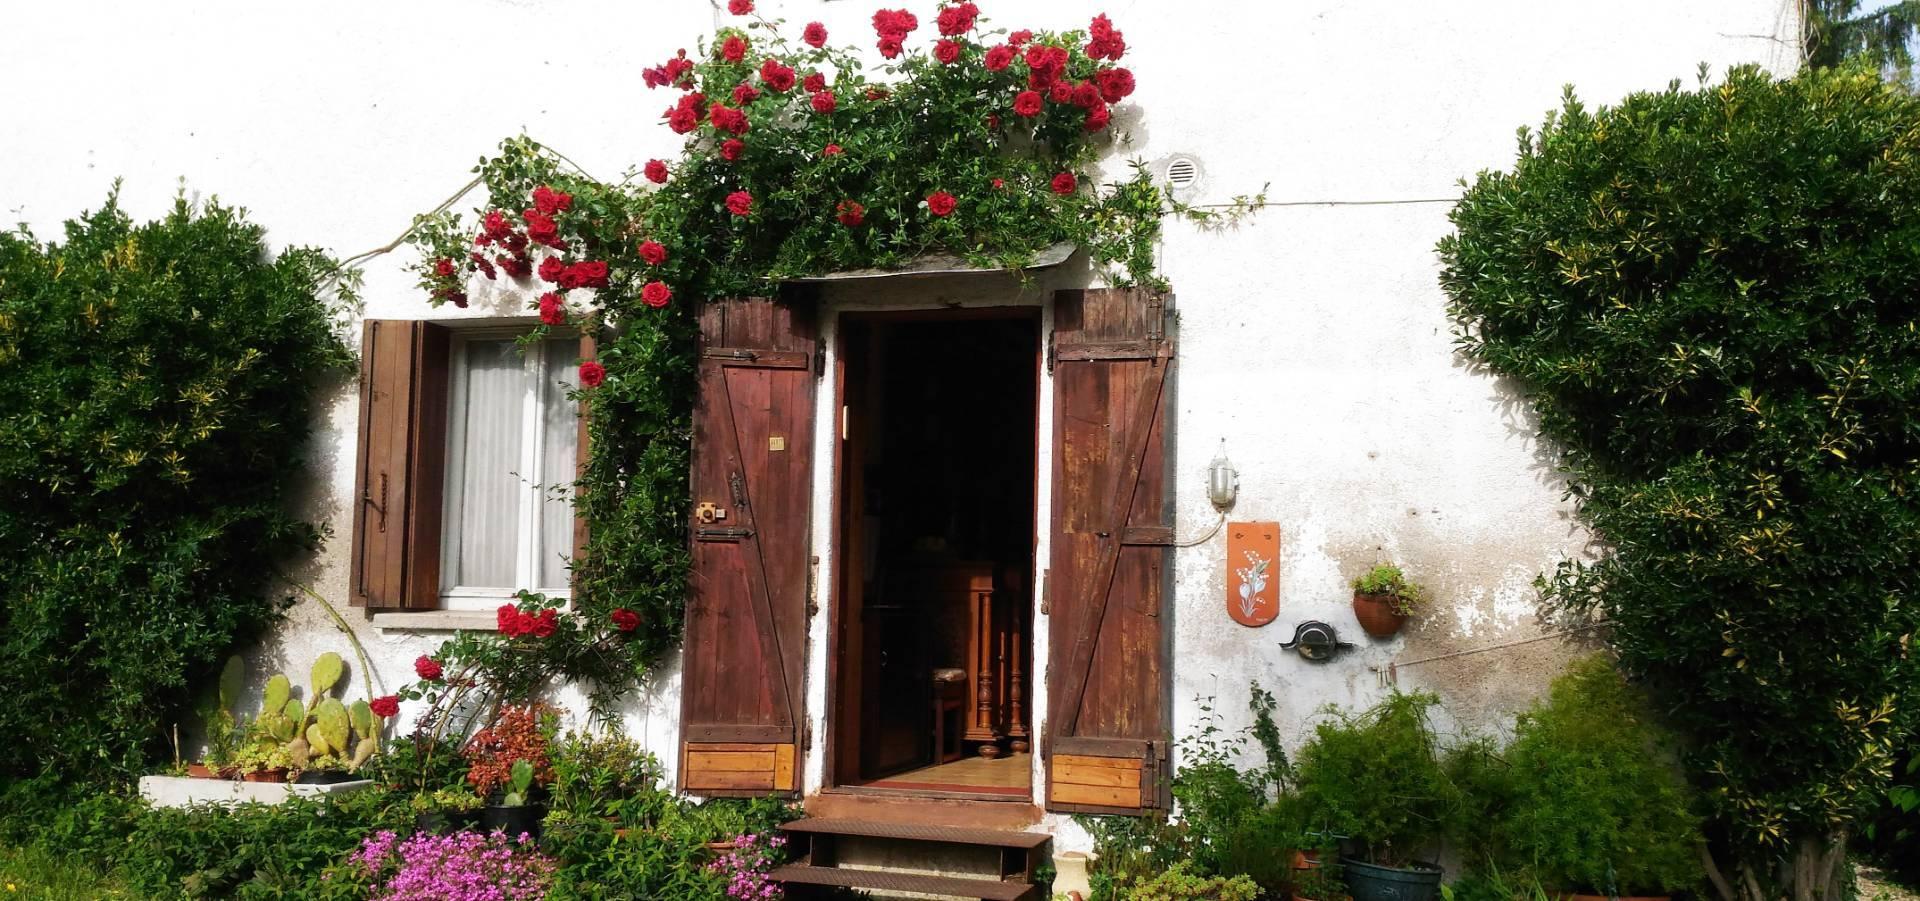 moruzzo vendita quart:  il cottage